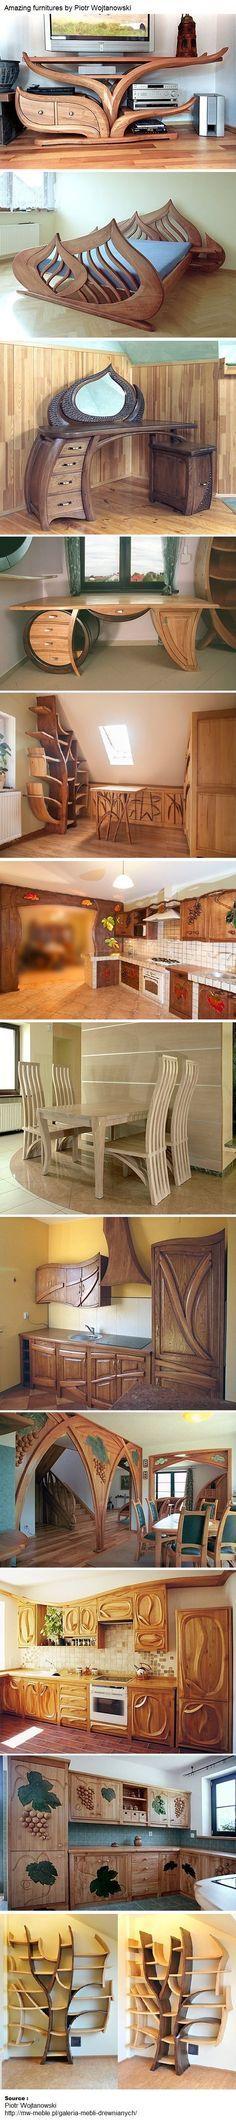 Amazing furnitures by Piotr Wojtanowski